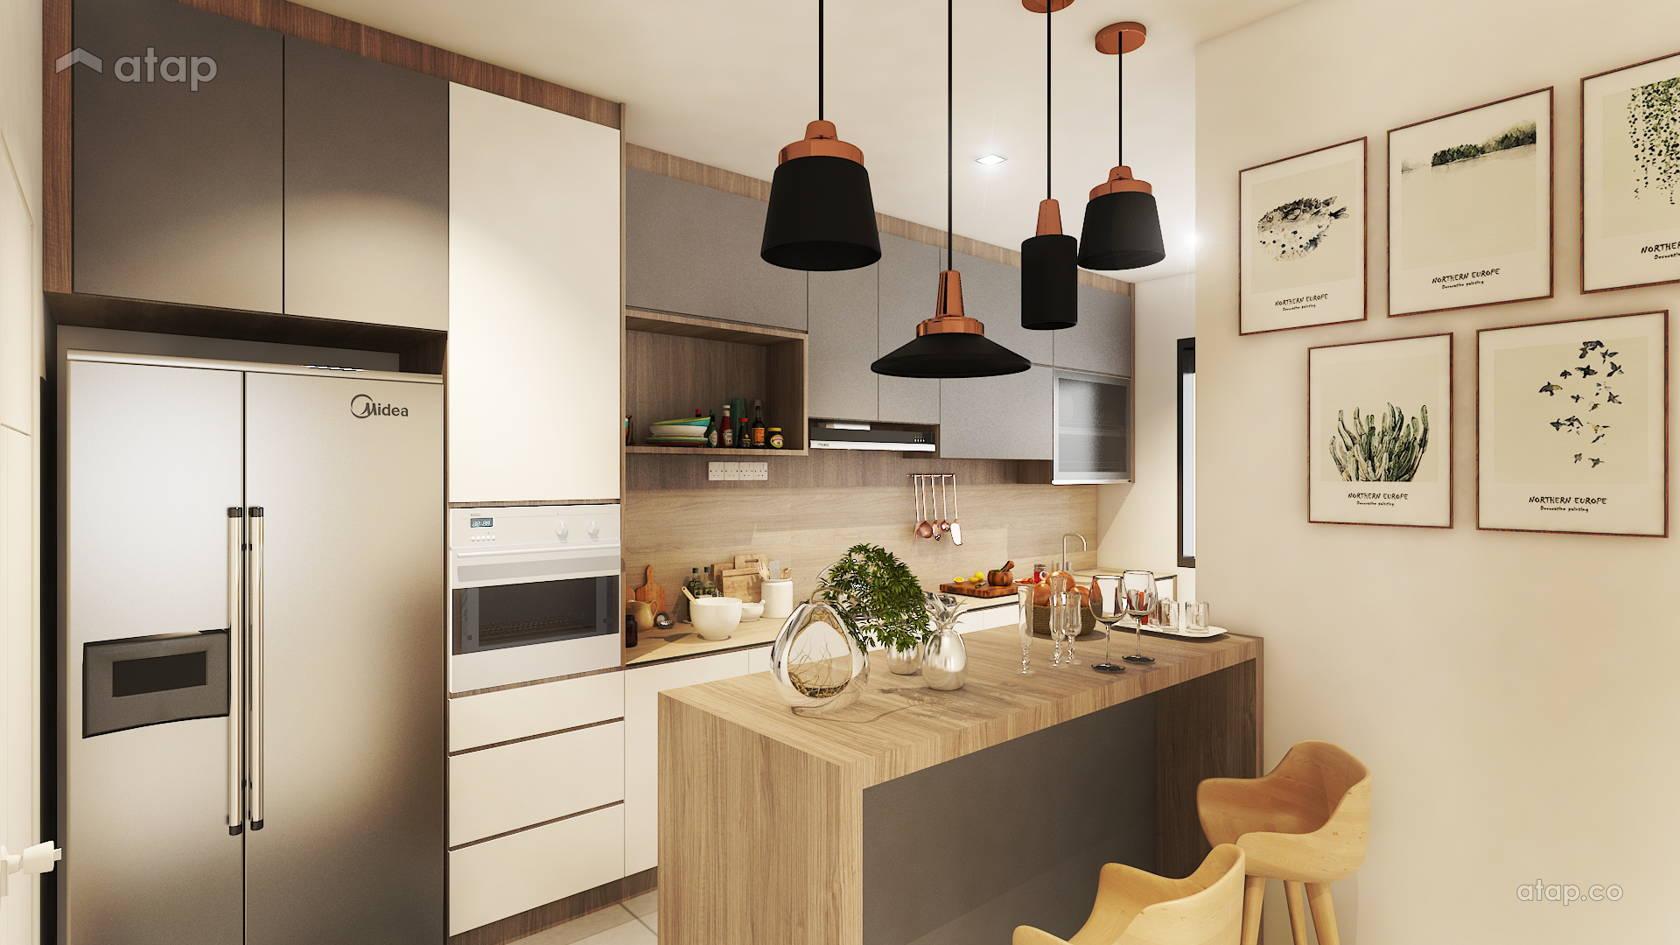 singapore hdb 5 room type interior design renovation ideas photos